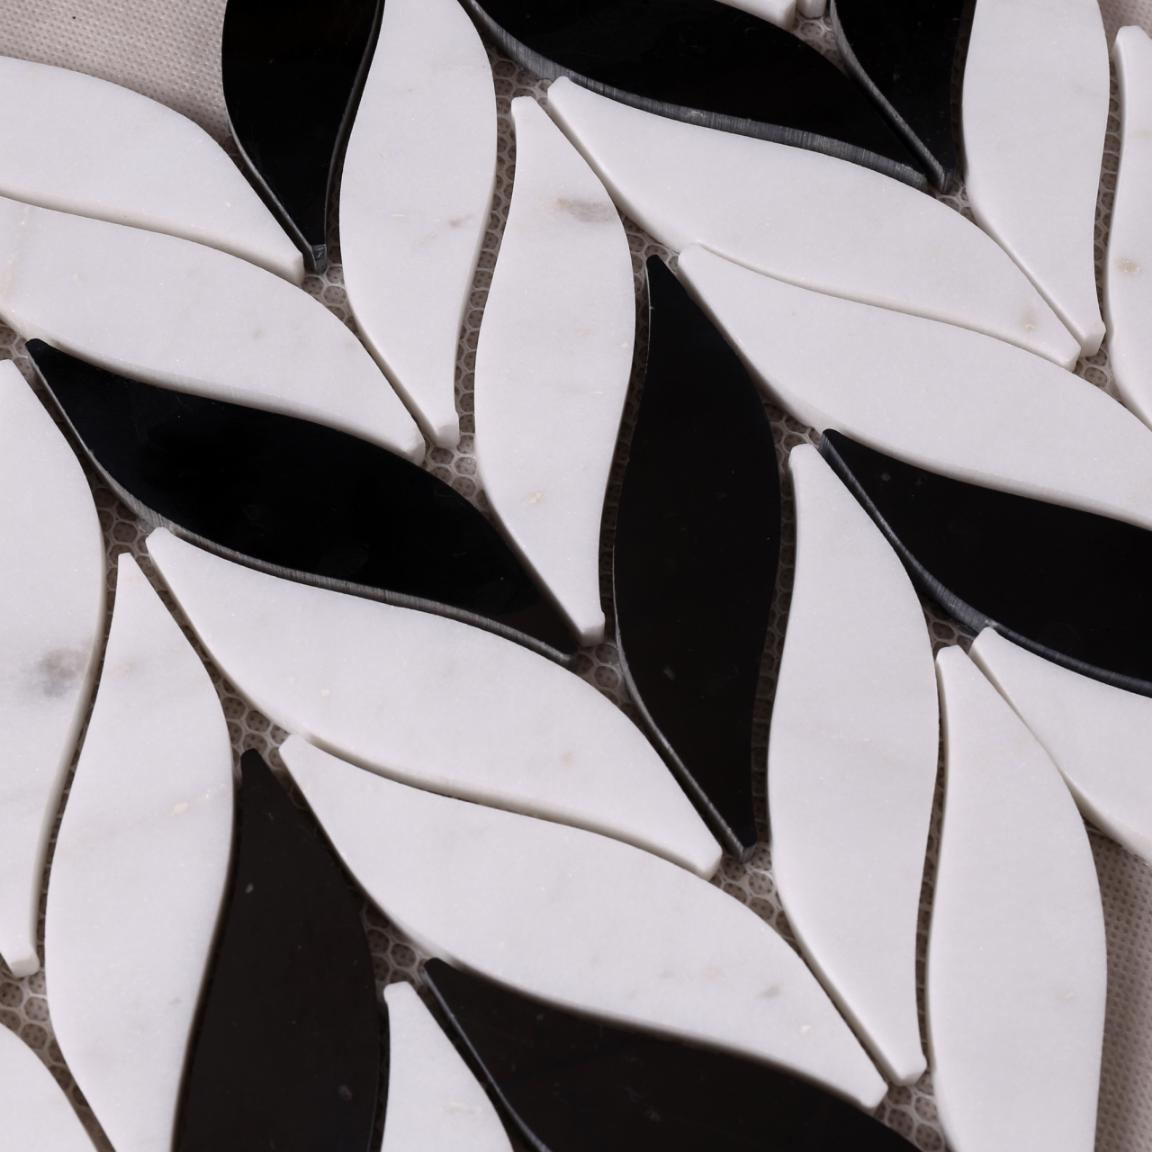 Heng Xing-natural stone mosaic tile | Stone Mosaic Tile | Heng Xing